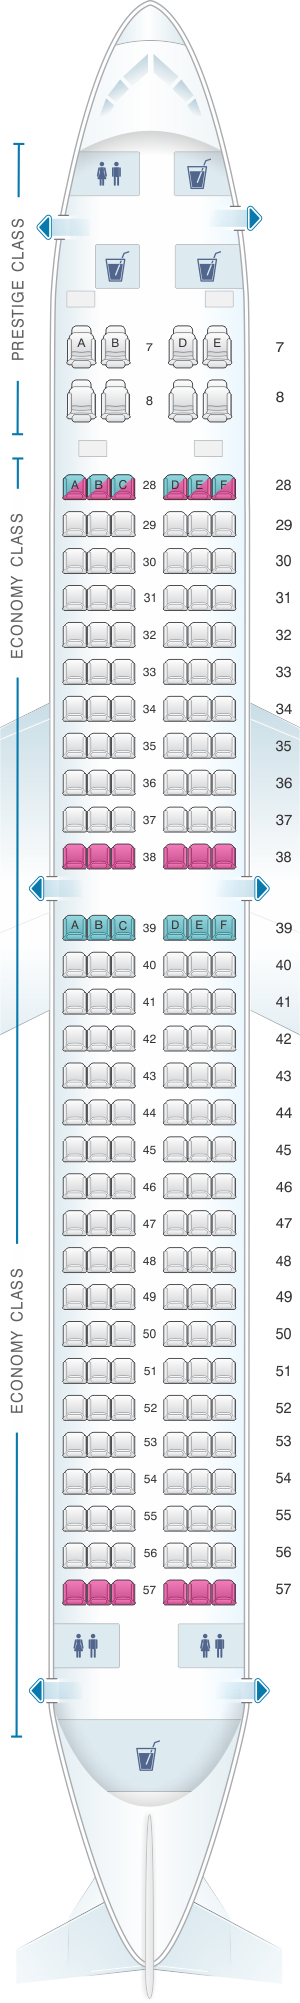 Seat map for Korean Air Boeing B737 900 188PAX